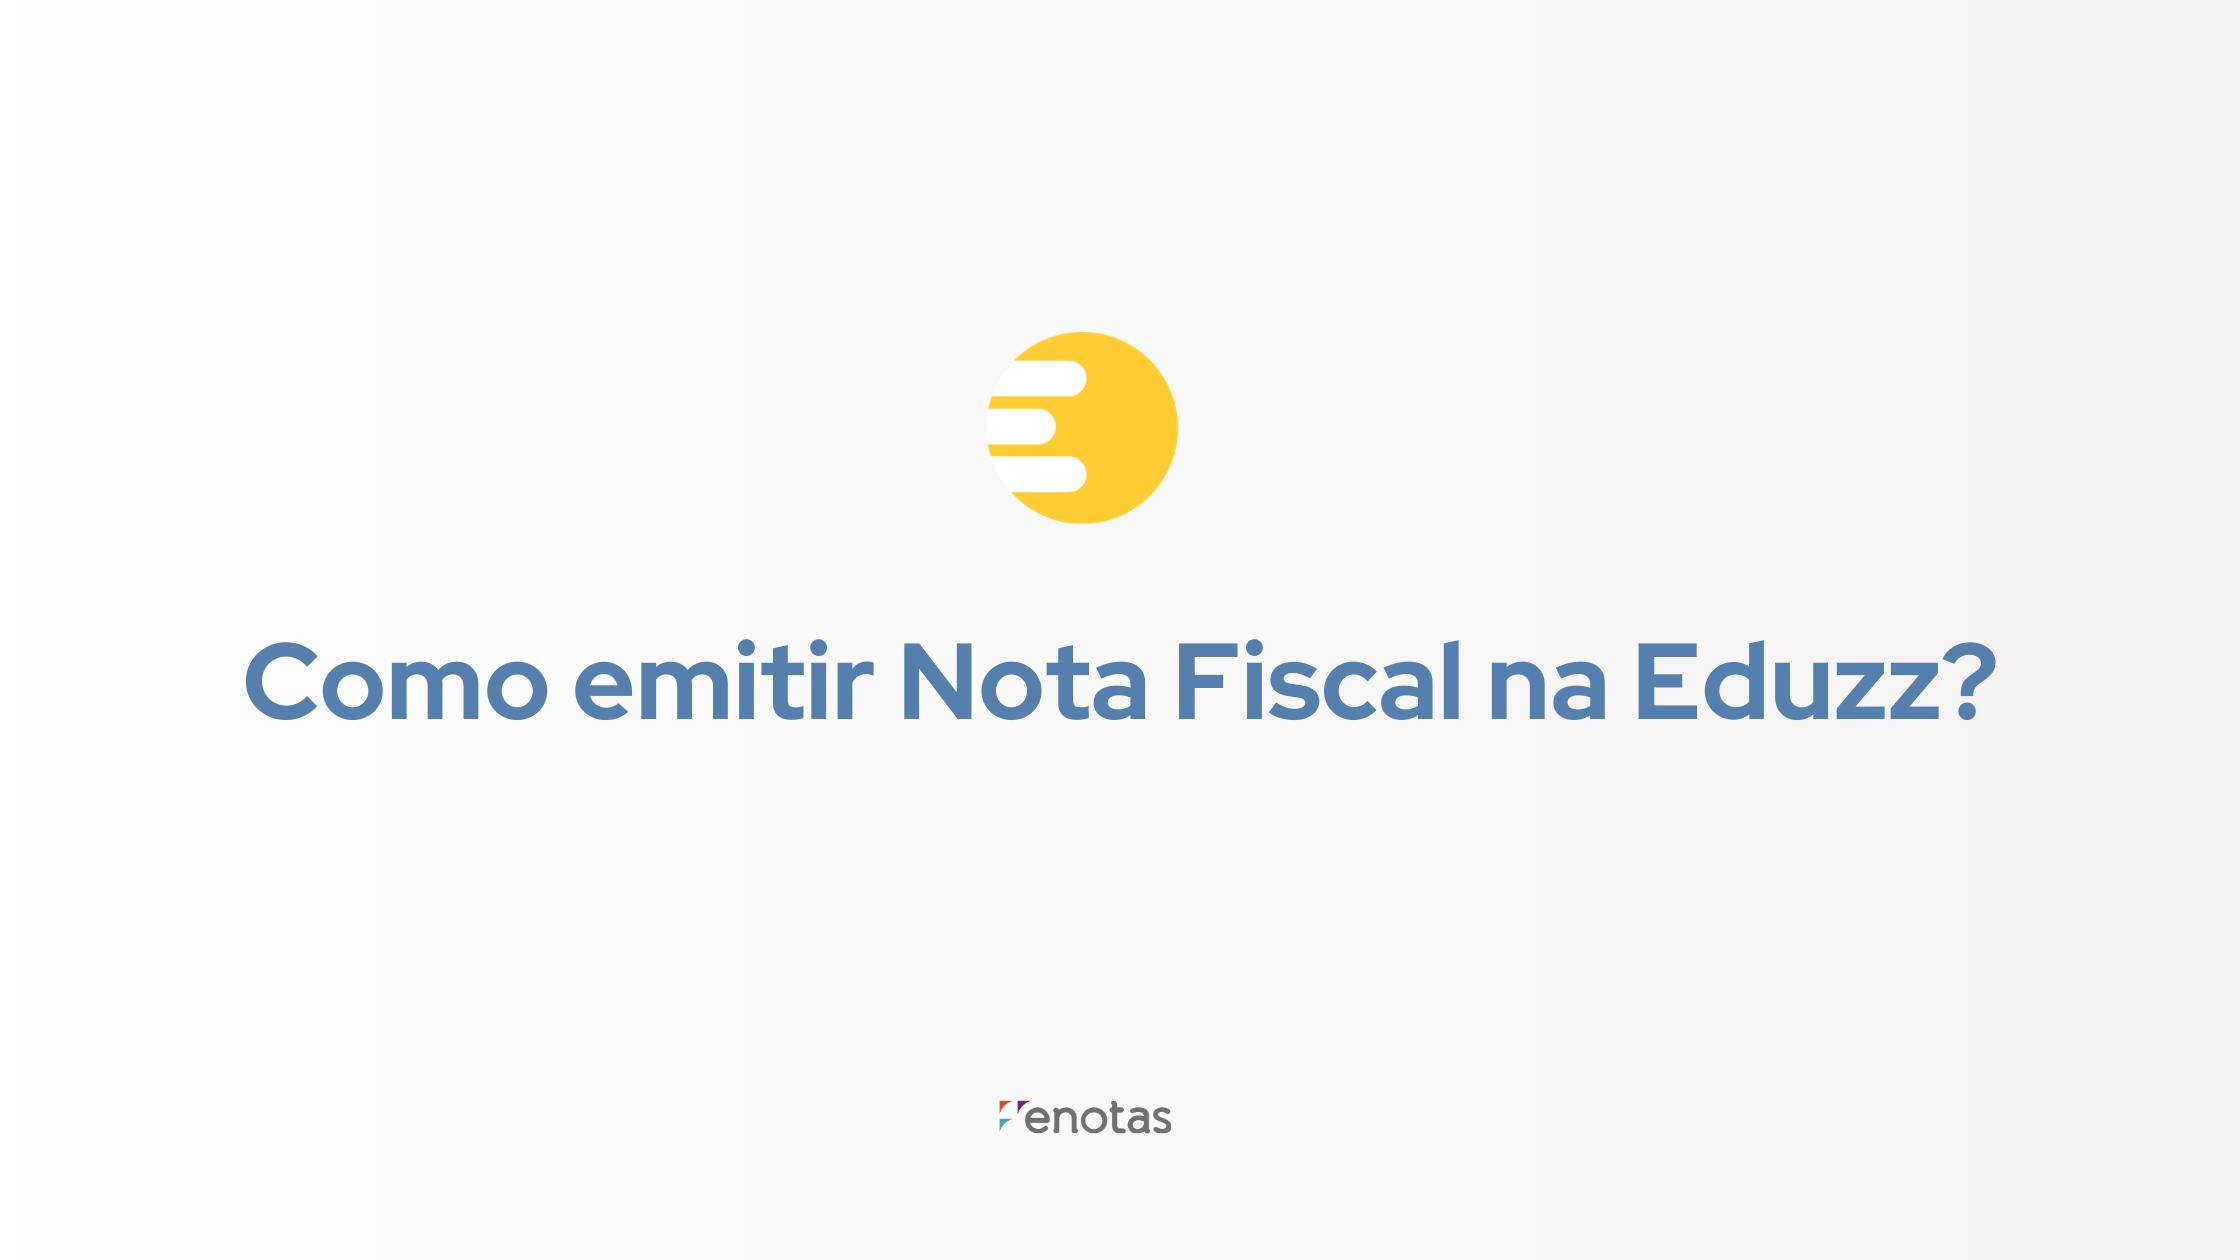 nota fiscal eduzz